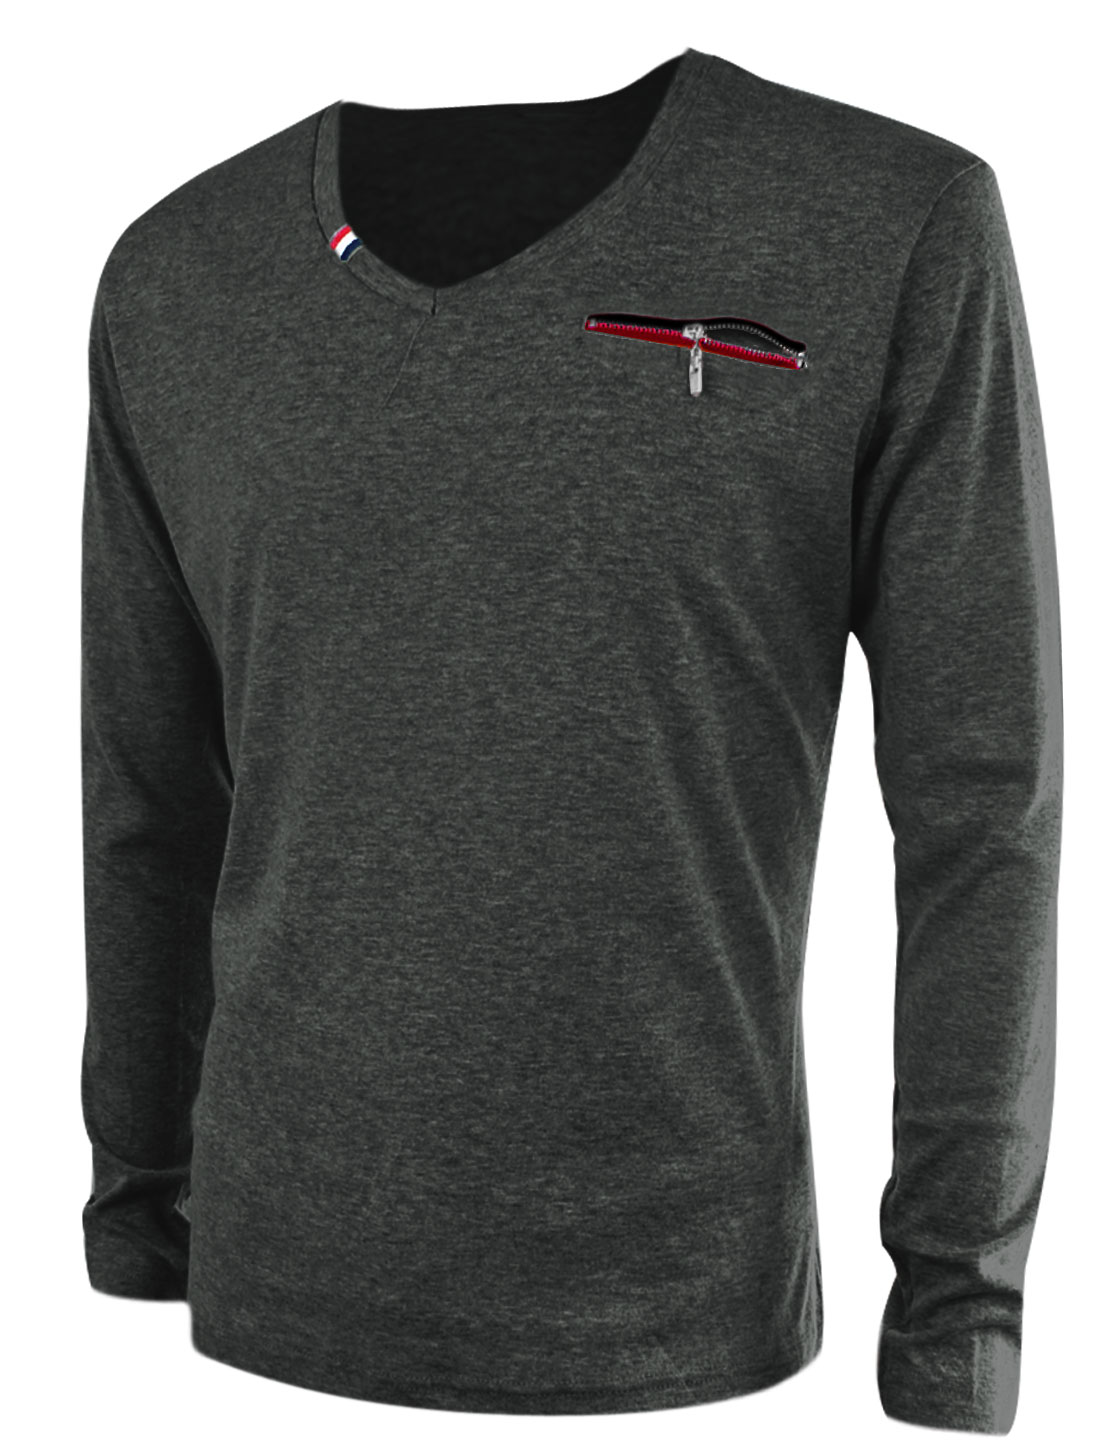 Fashion V Neck Fake Zip-Up Chest Pocket Shirt for Men Dark Gray M